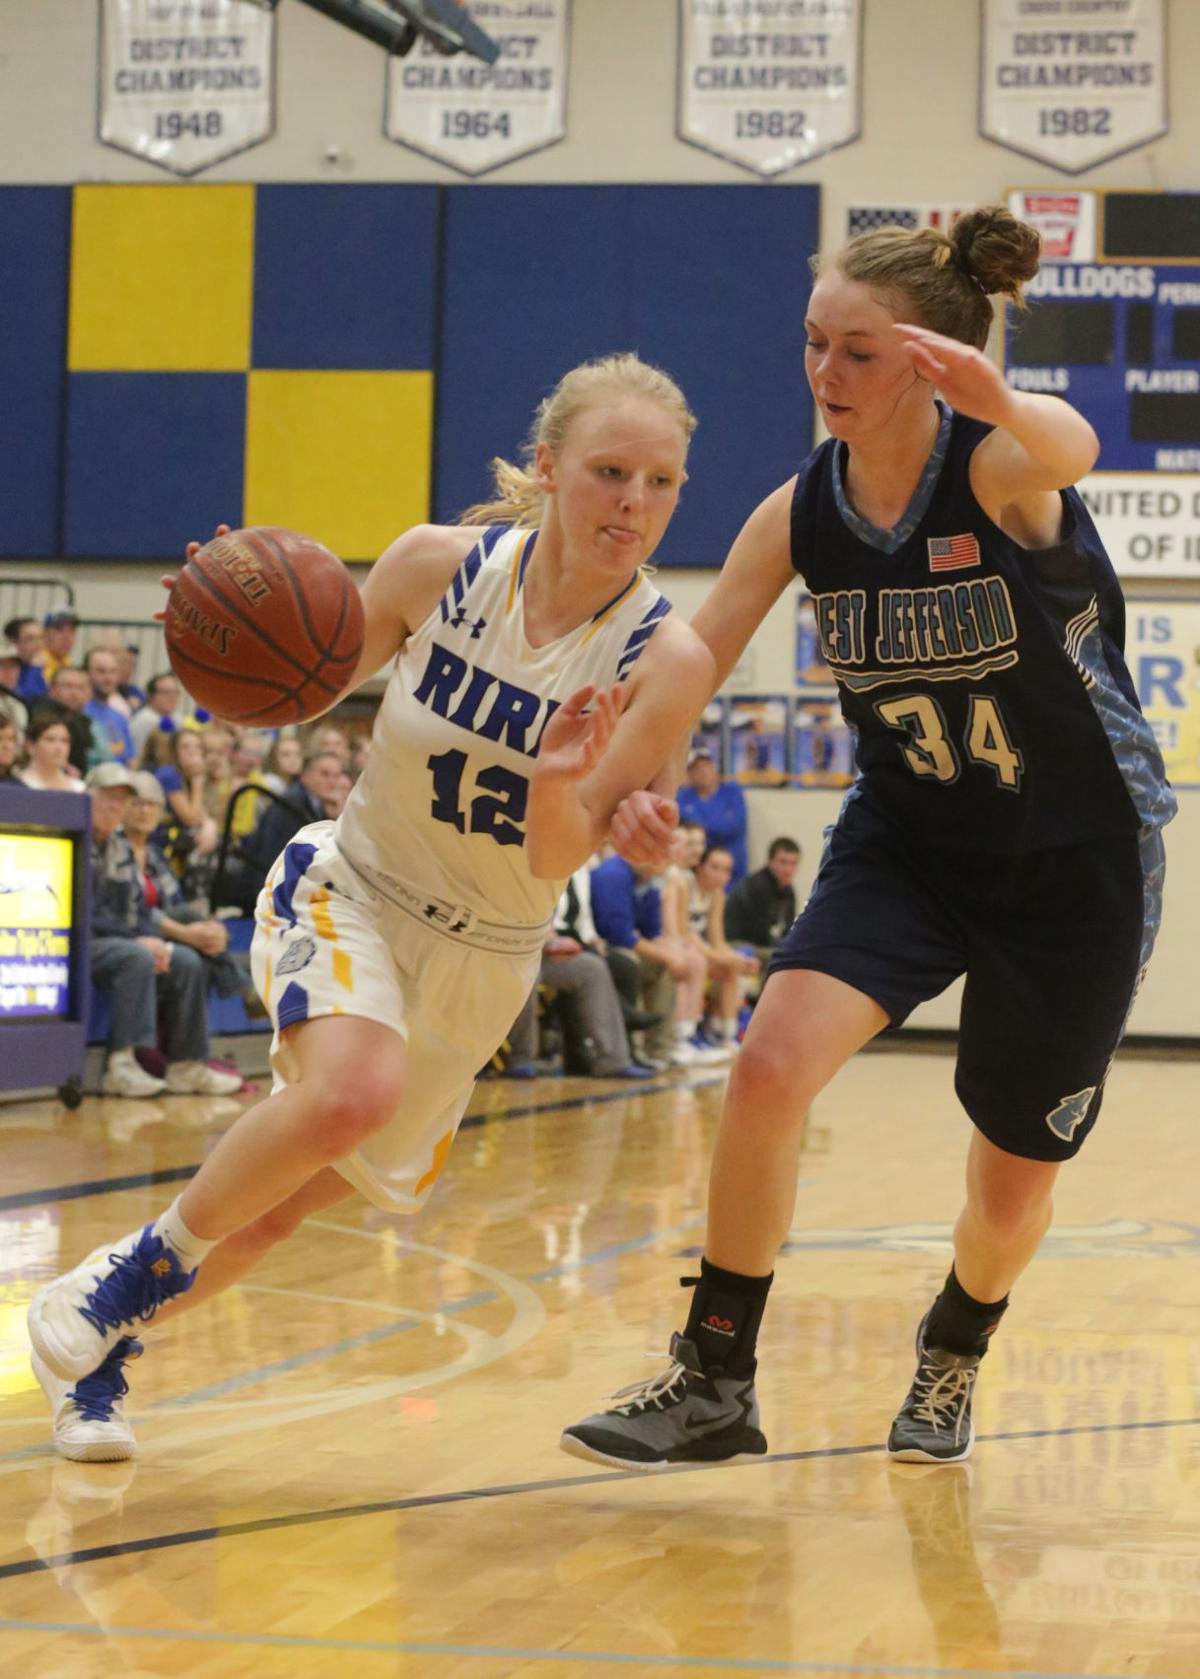 Ririe High vs West Jefferson girls basketball